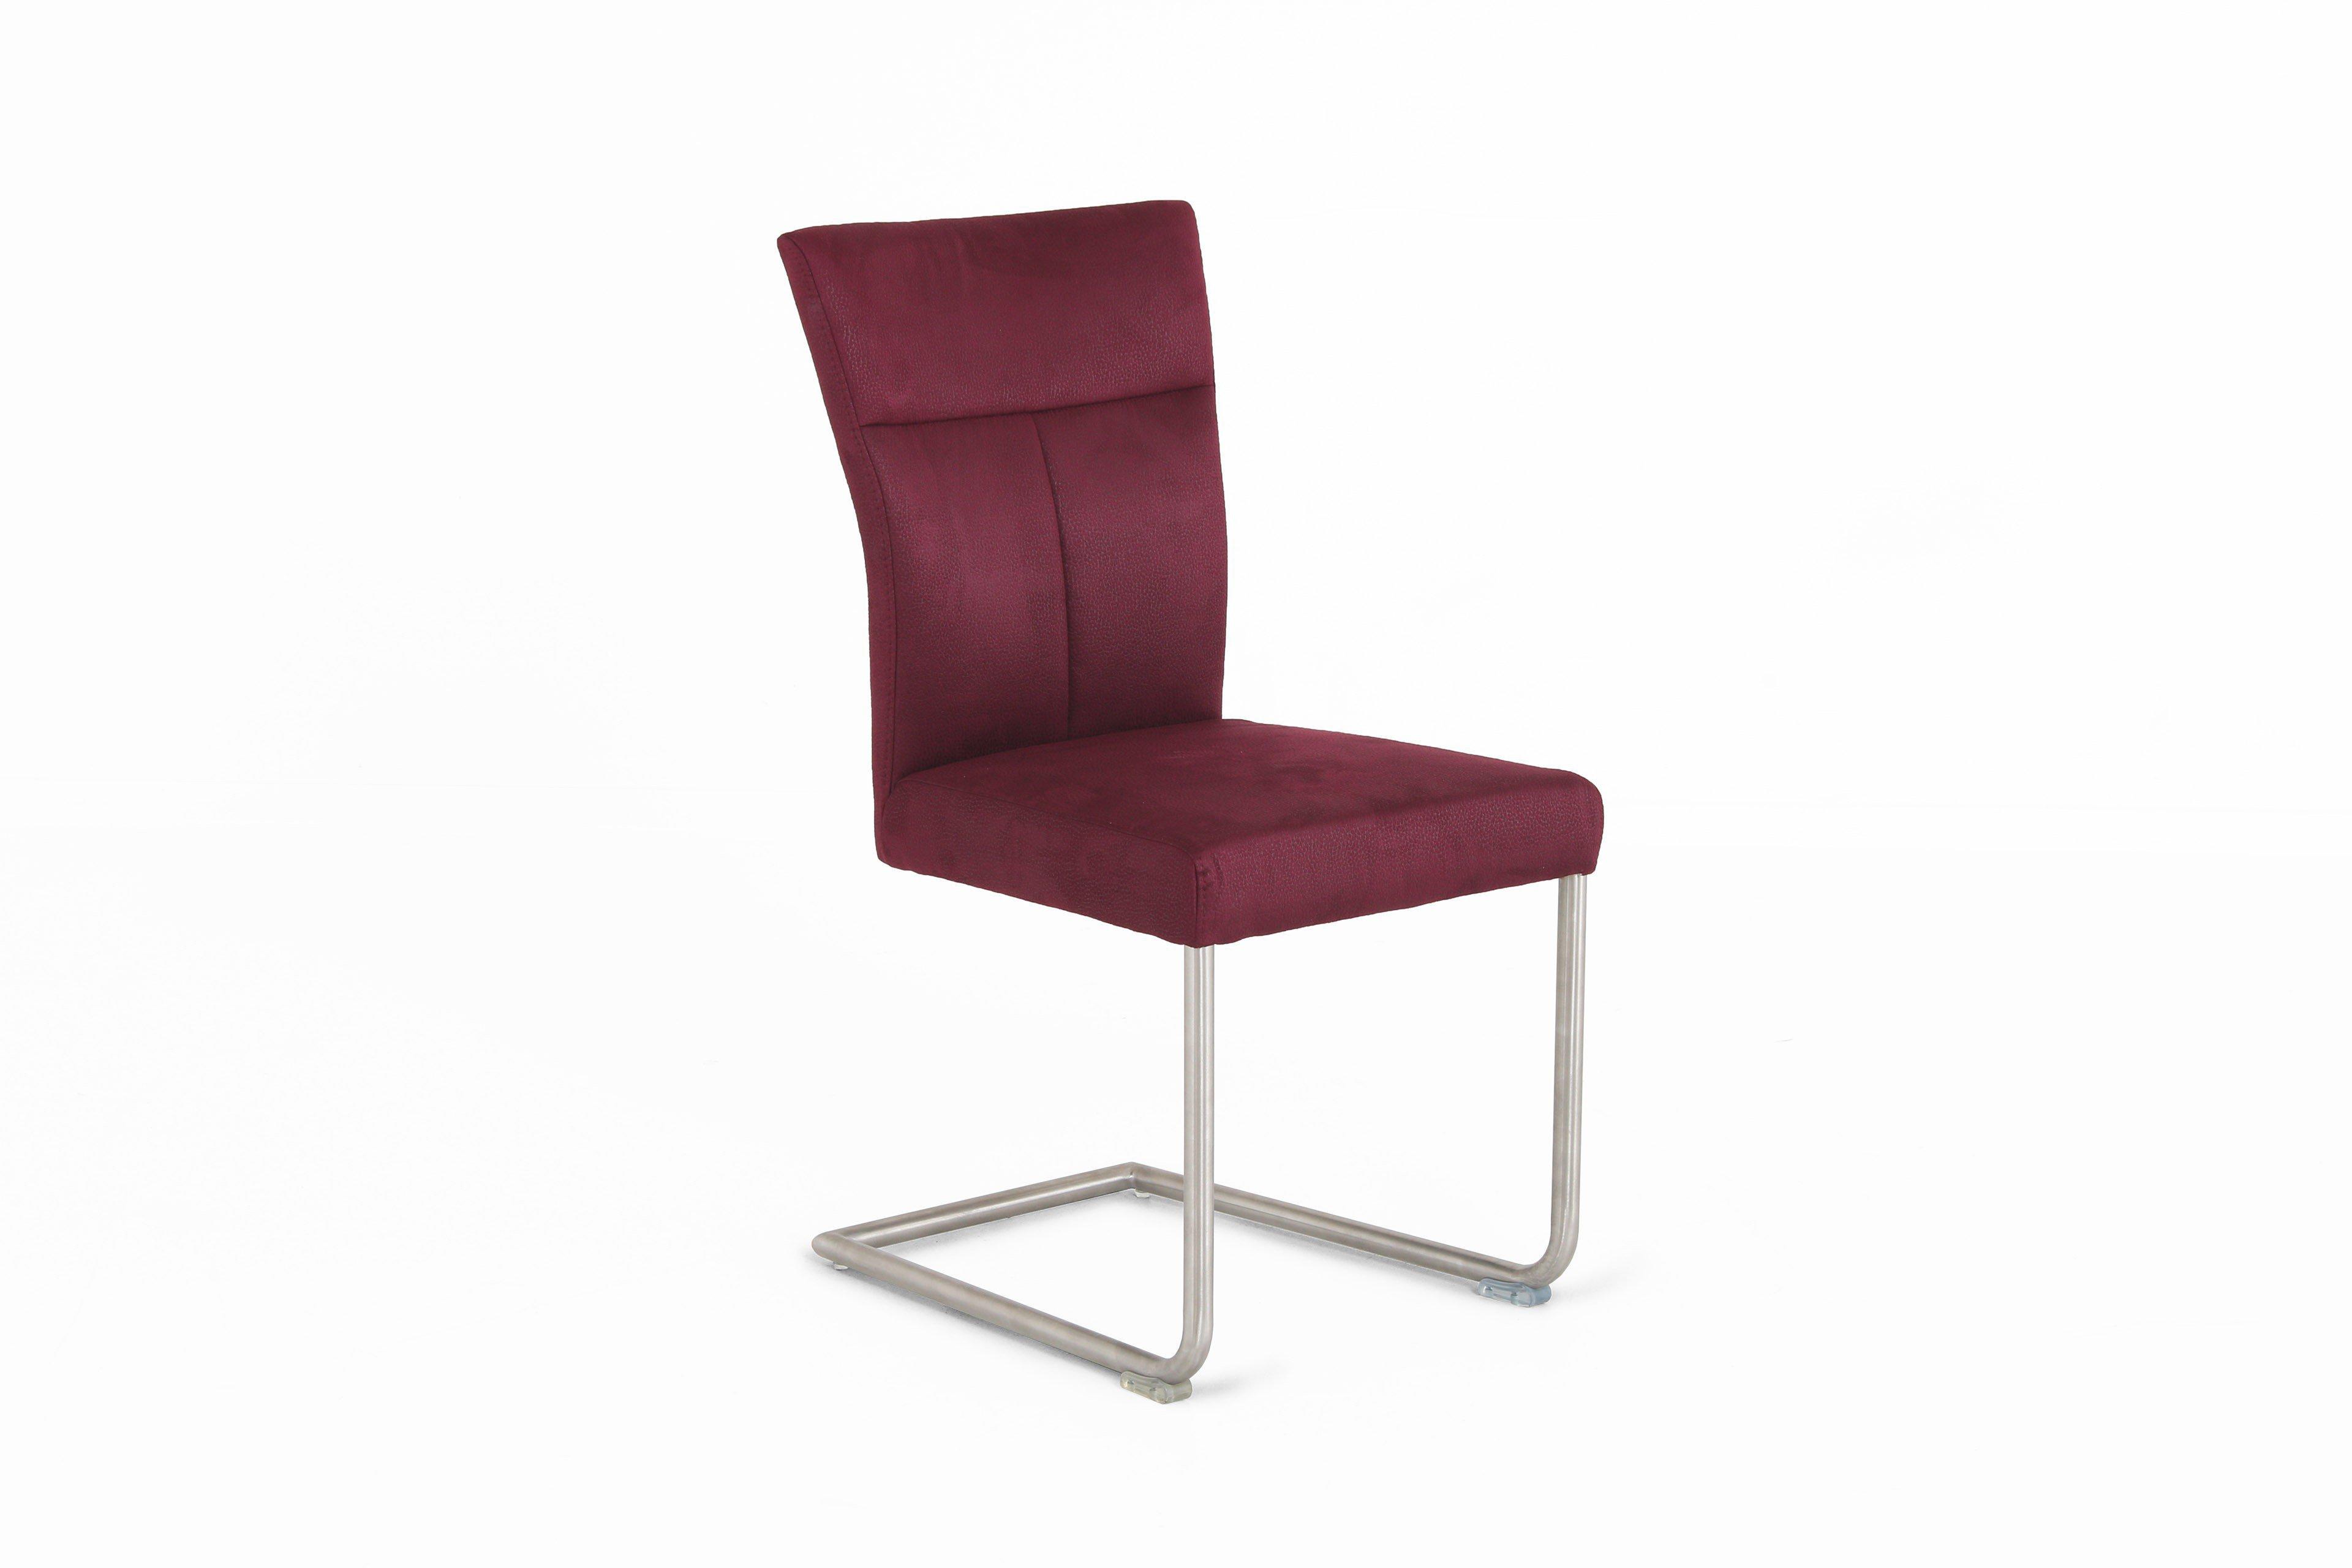 niehoff freischwinger super sedia rot m bel letz ihr online shop. Black Bedroom Furniture Sets. Home Design Ideas